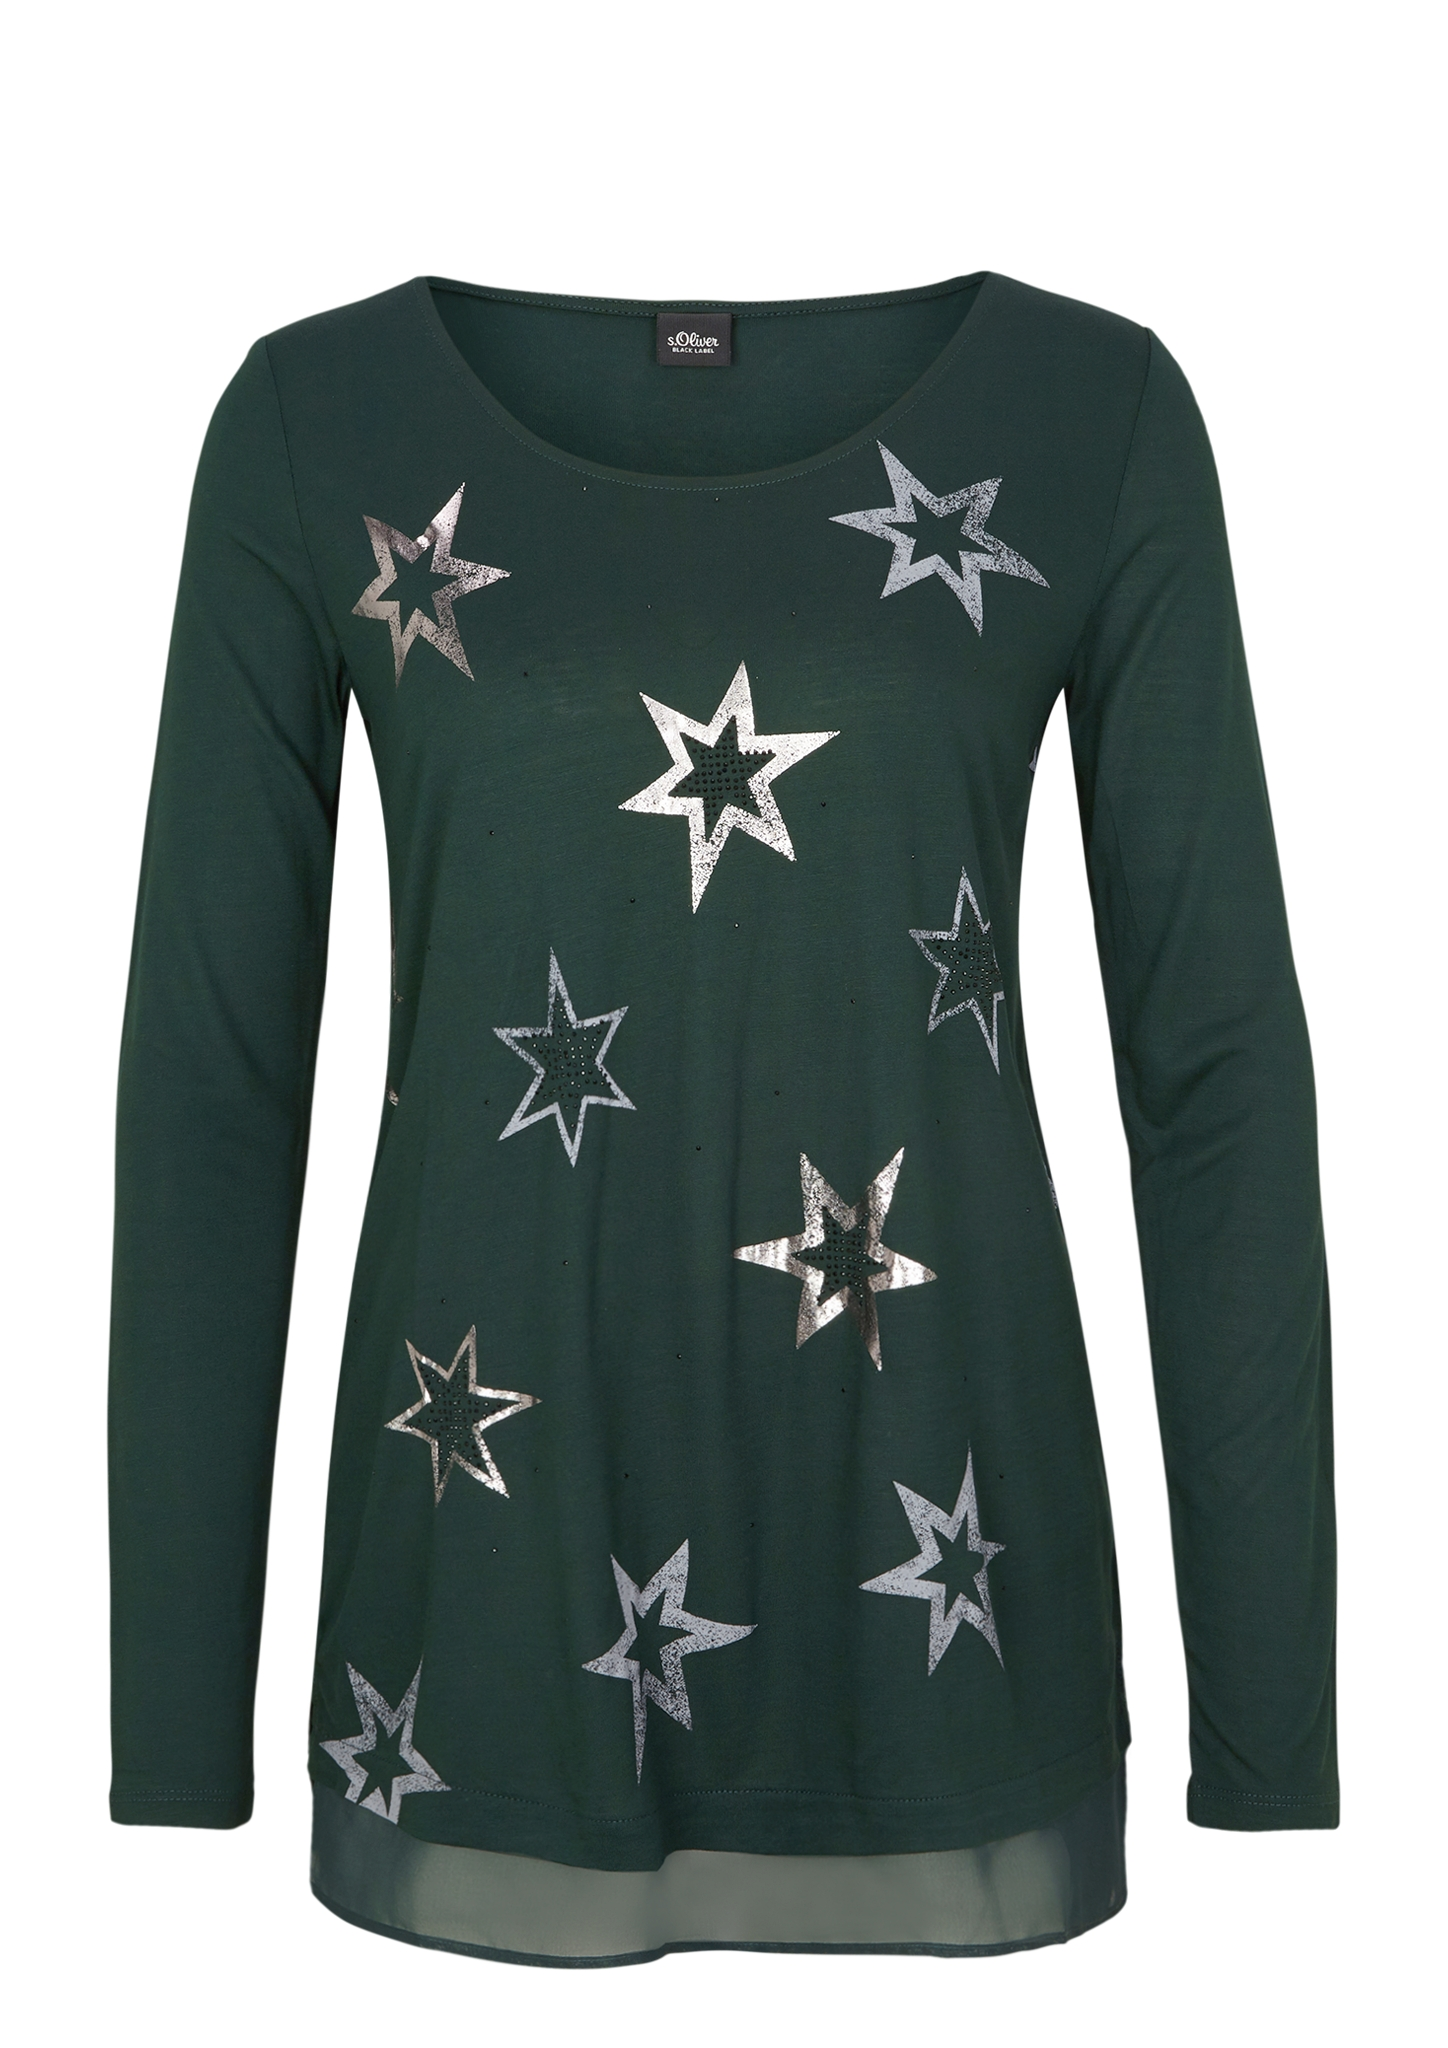 Longshirt | Bekleidung > Shirts > Longshirts | Grün | 100% viskose | s.Oliver BLACK LABEL